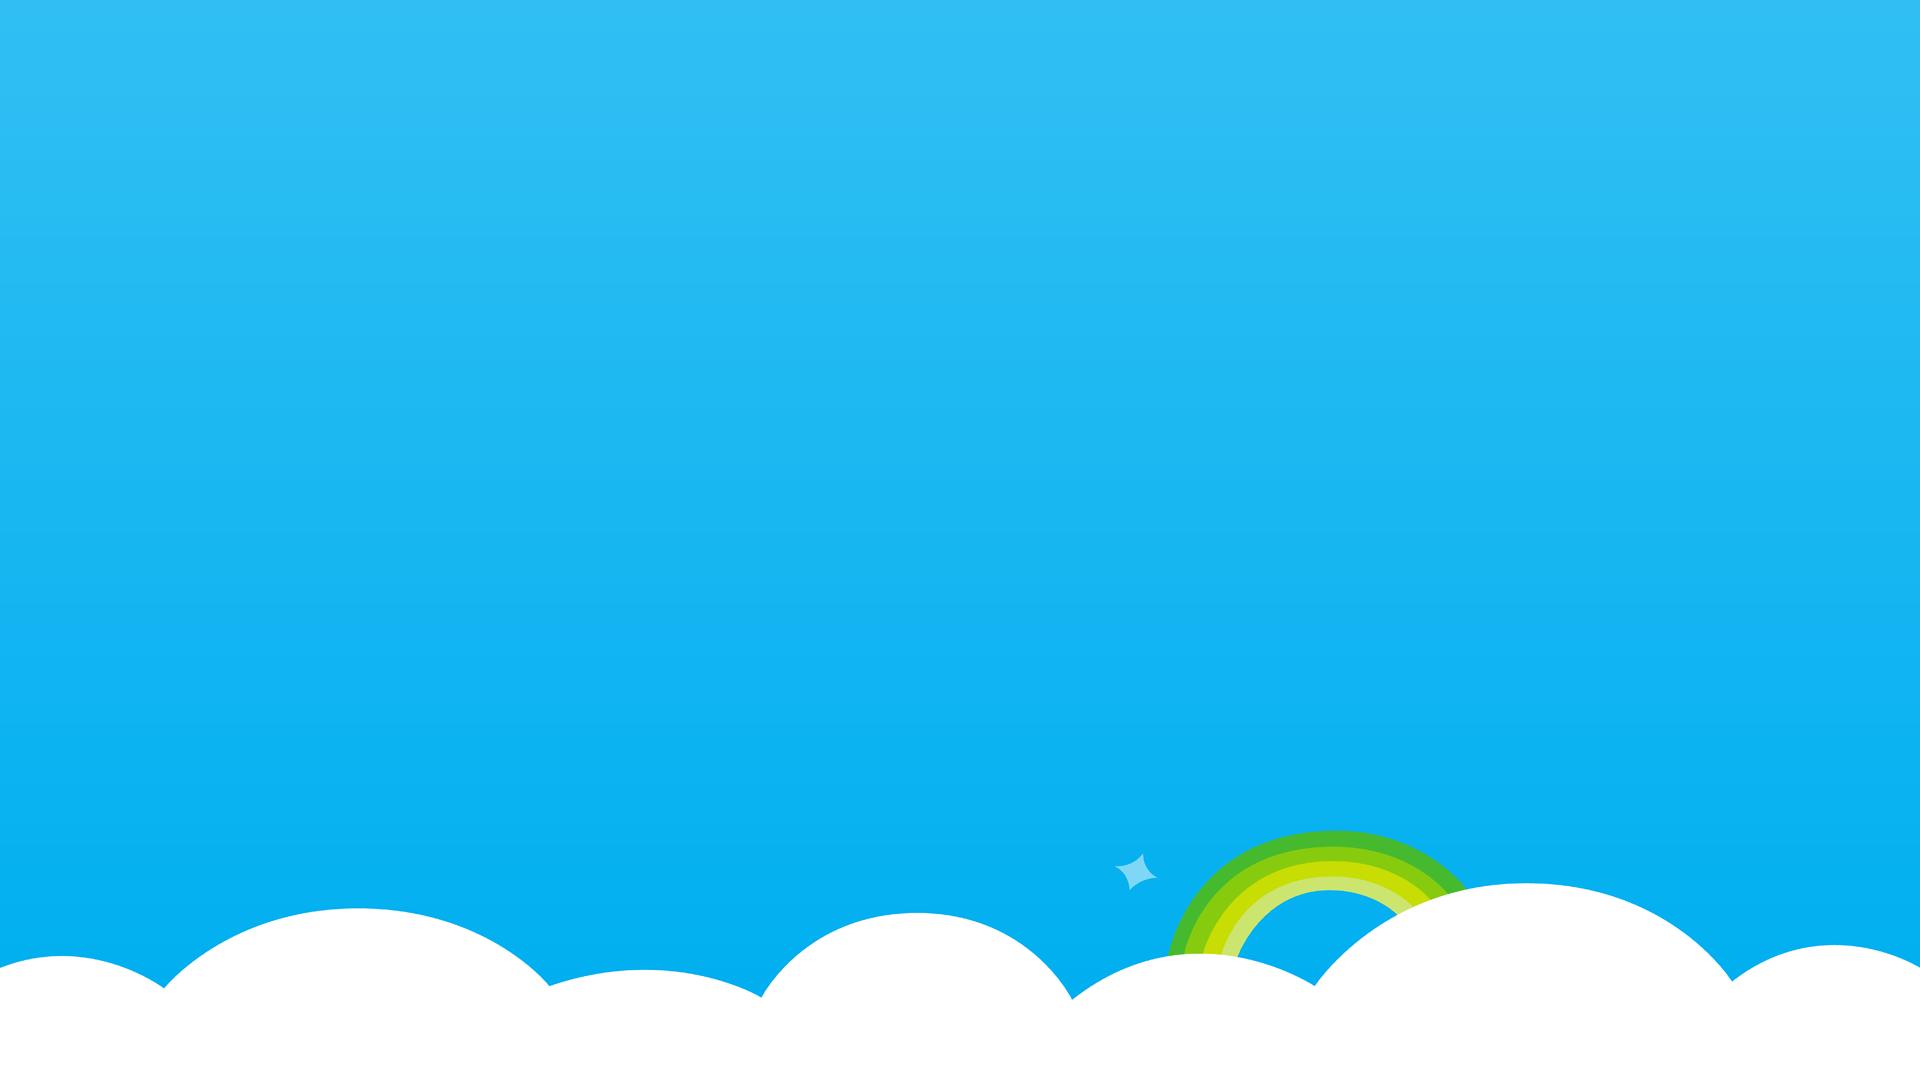 no-plugin-skype-on-edge-but-not-on-chrome-firefox